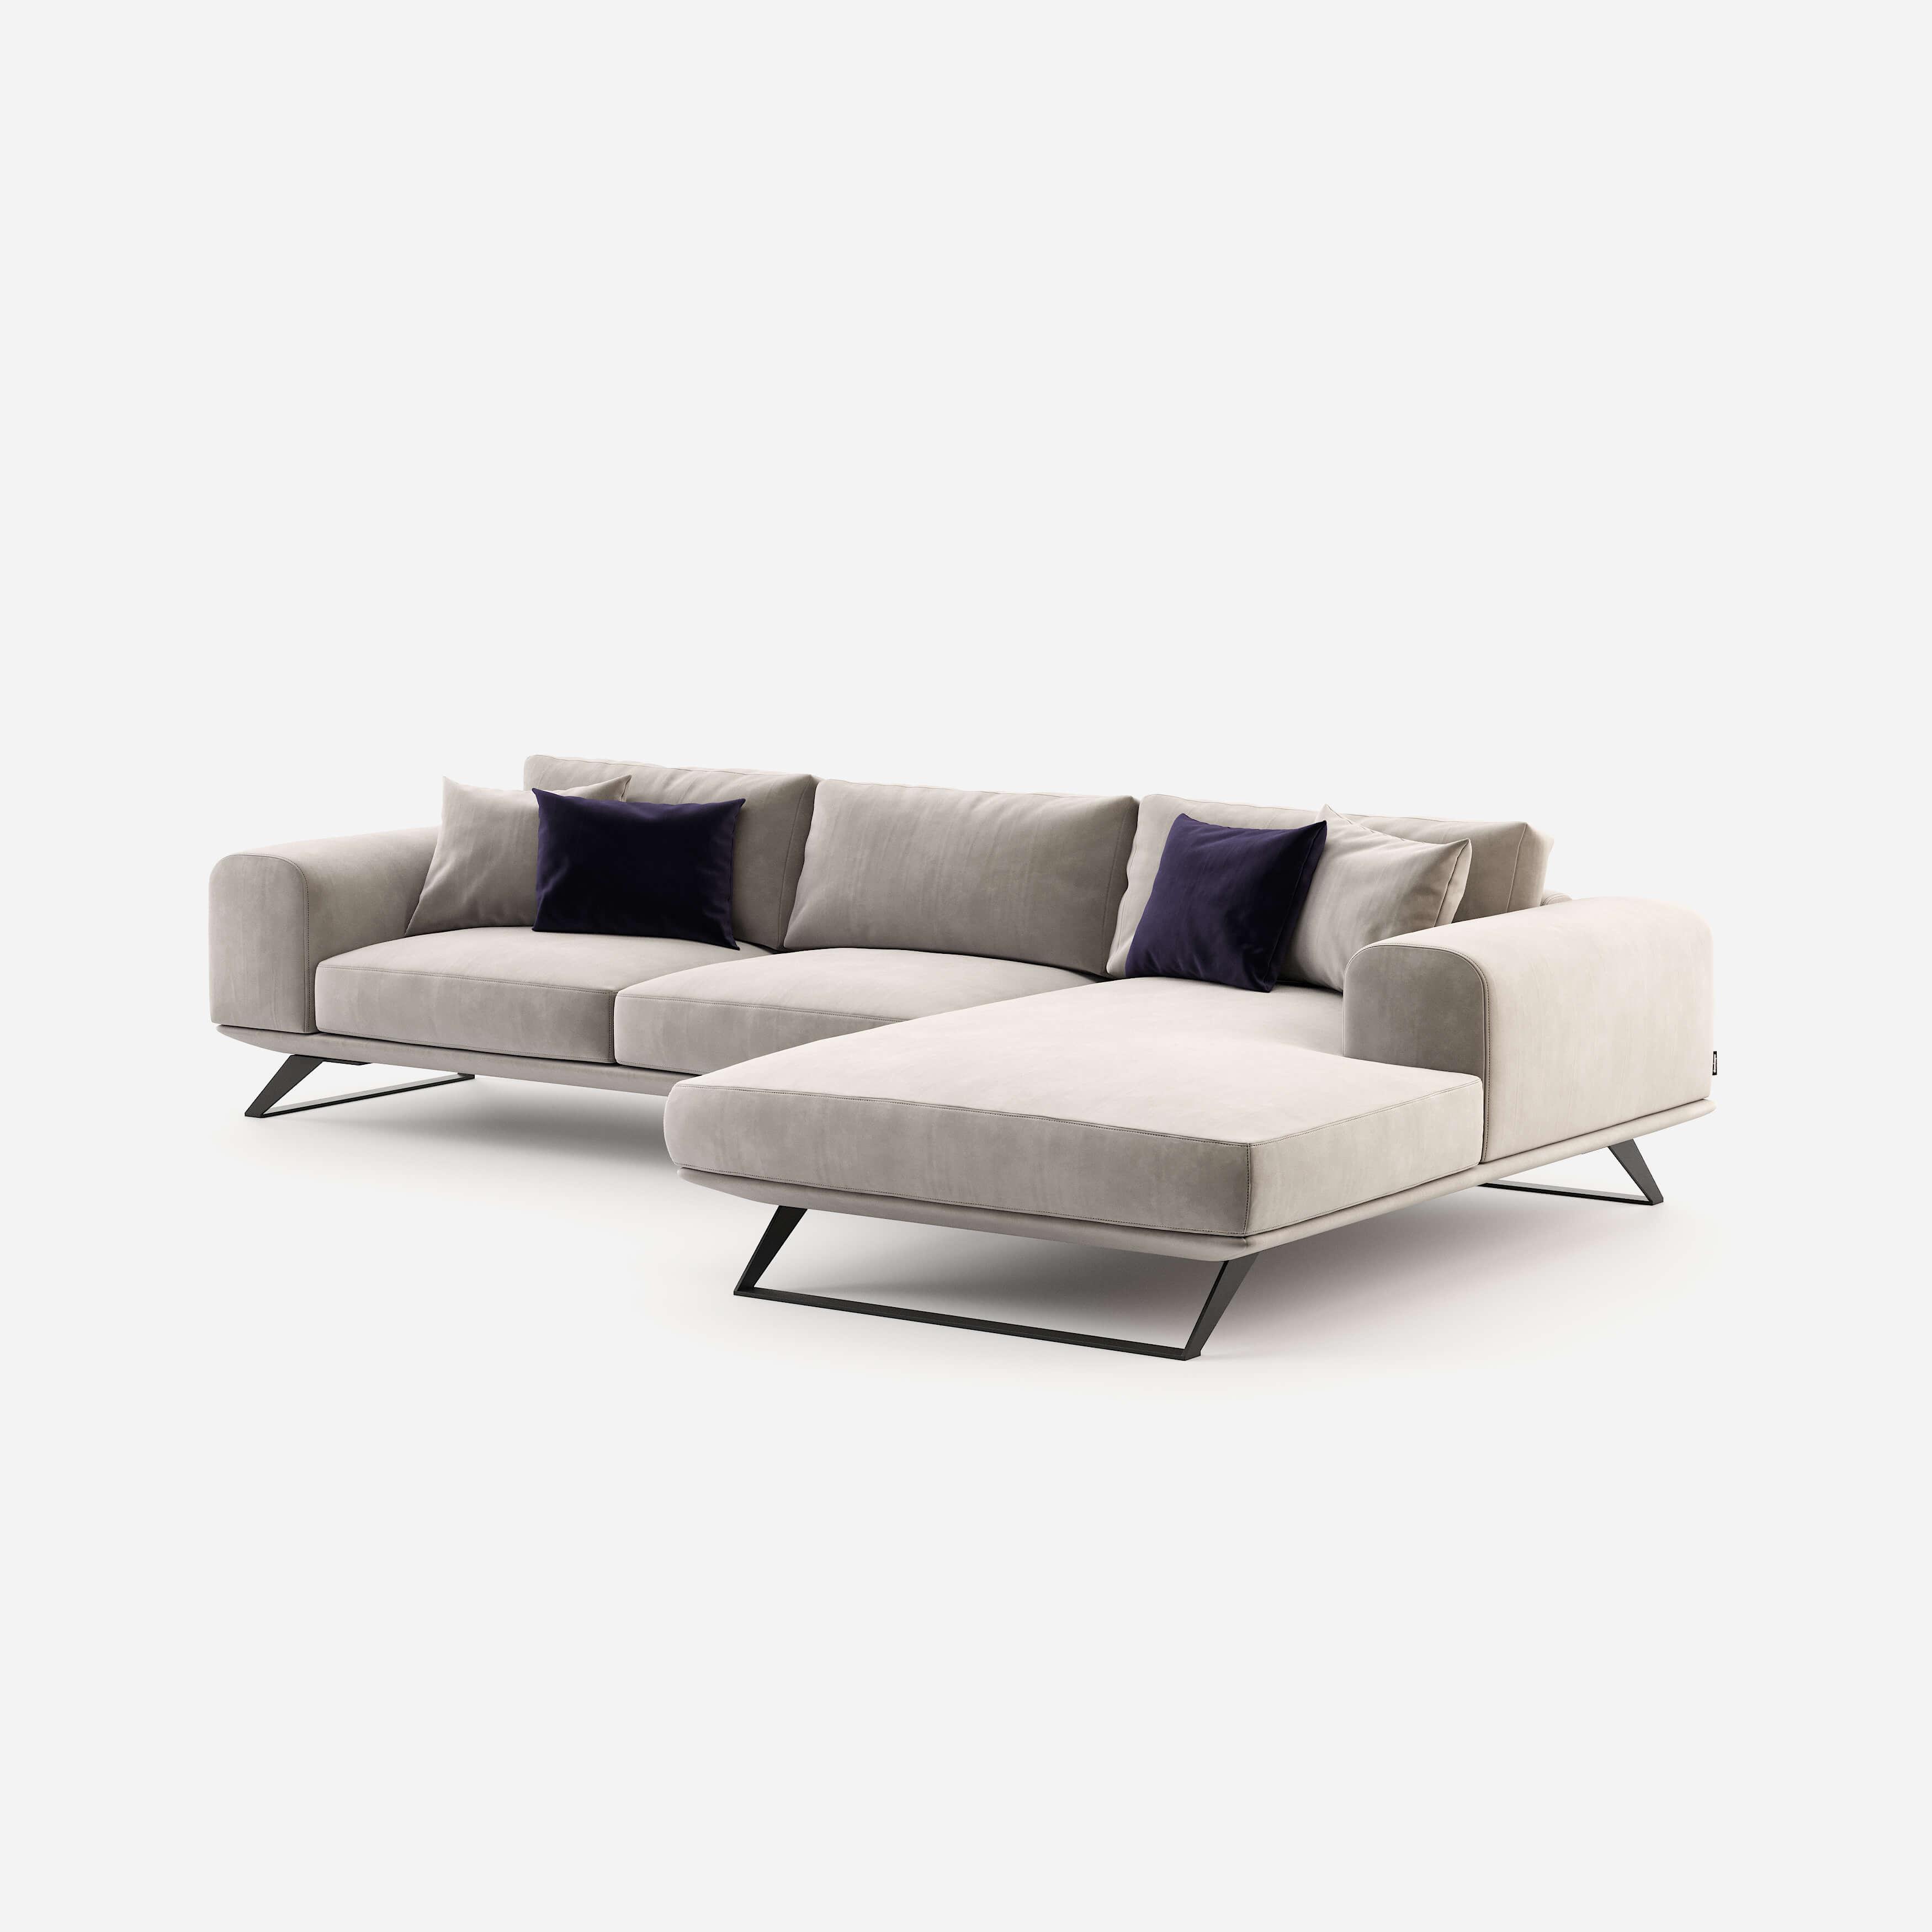 aniston-sofa-velvet-metal-living-room-comfortable-seating-furniture-domkapa-1